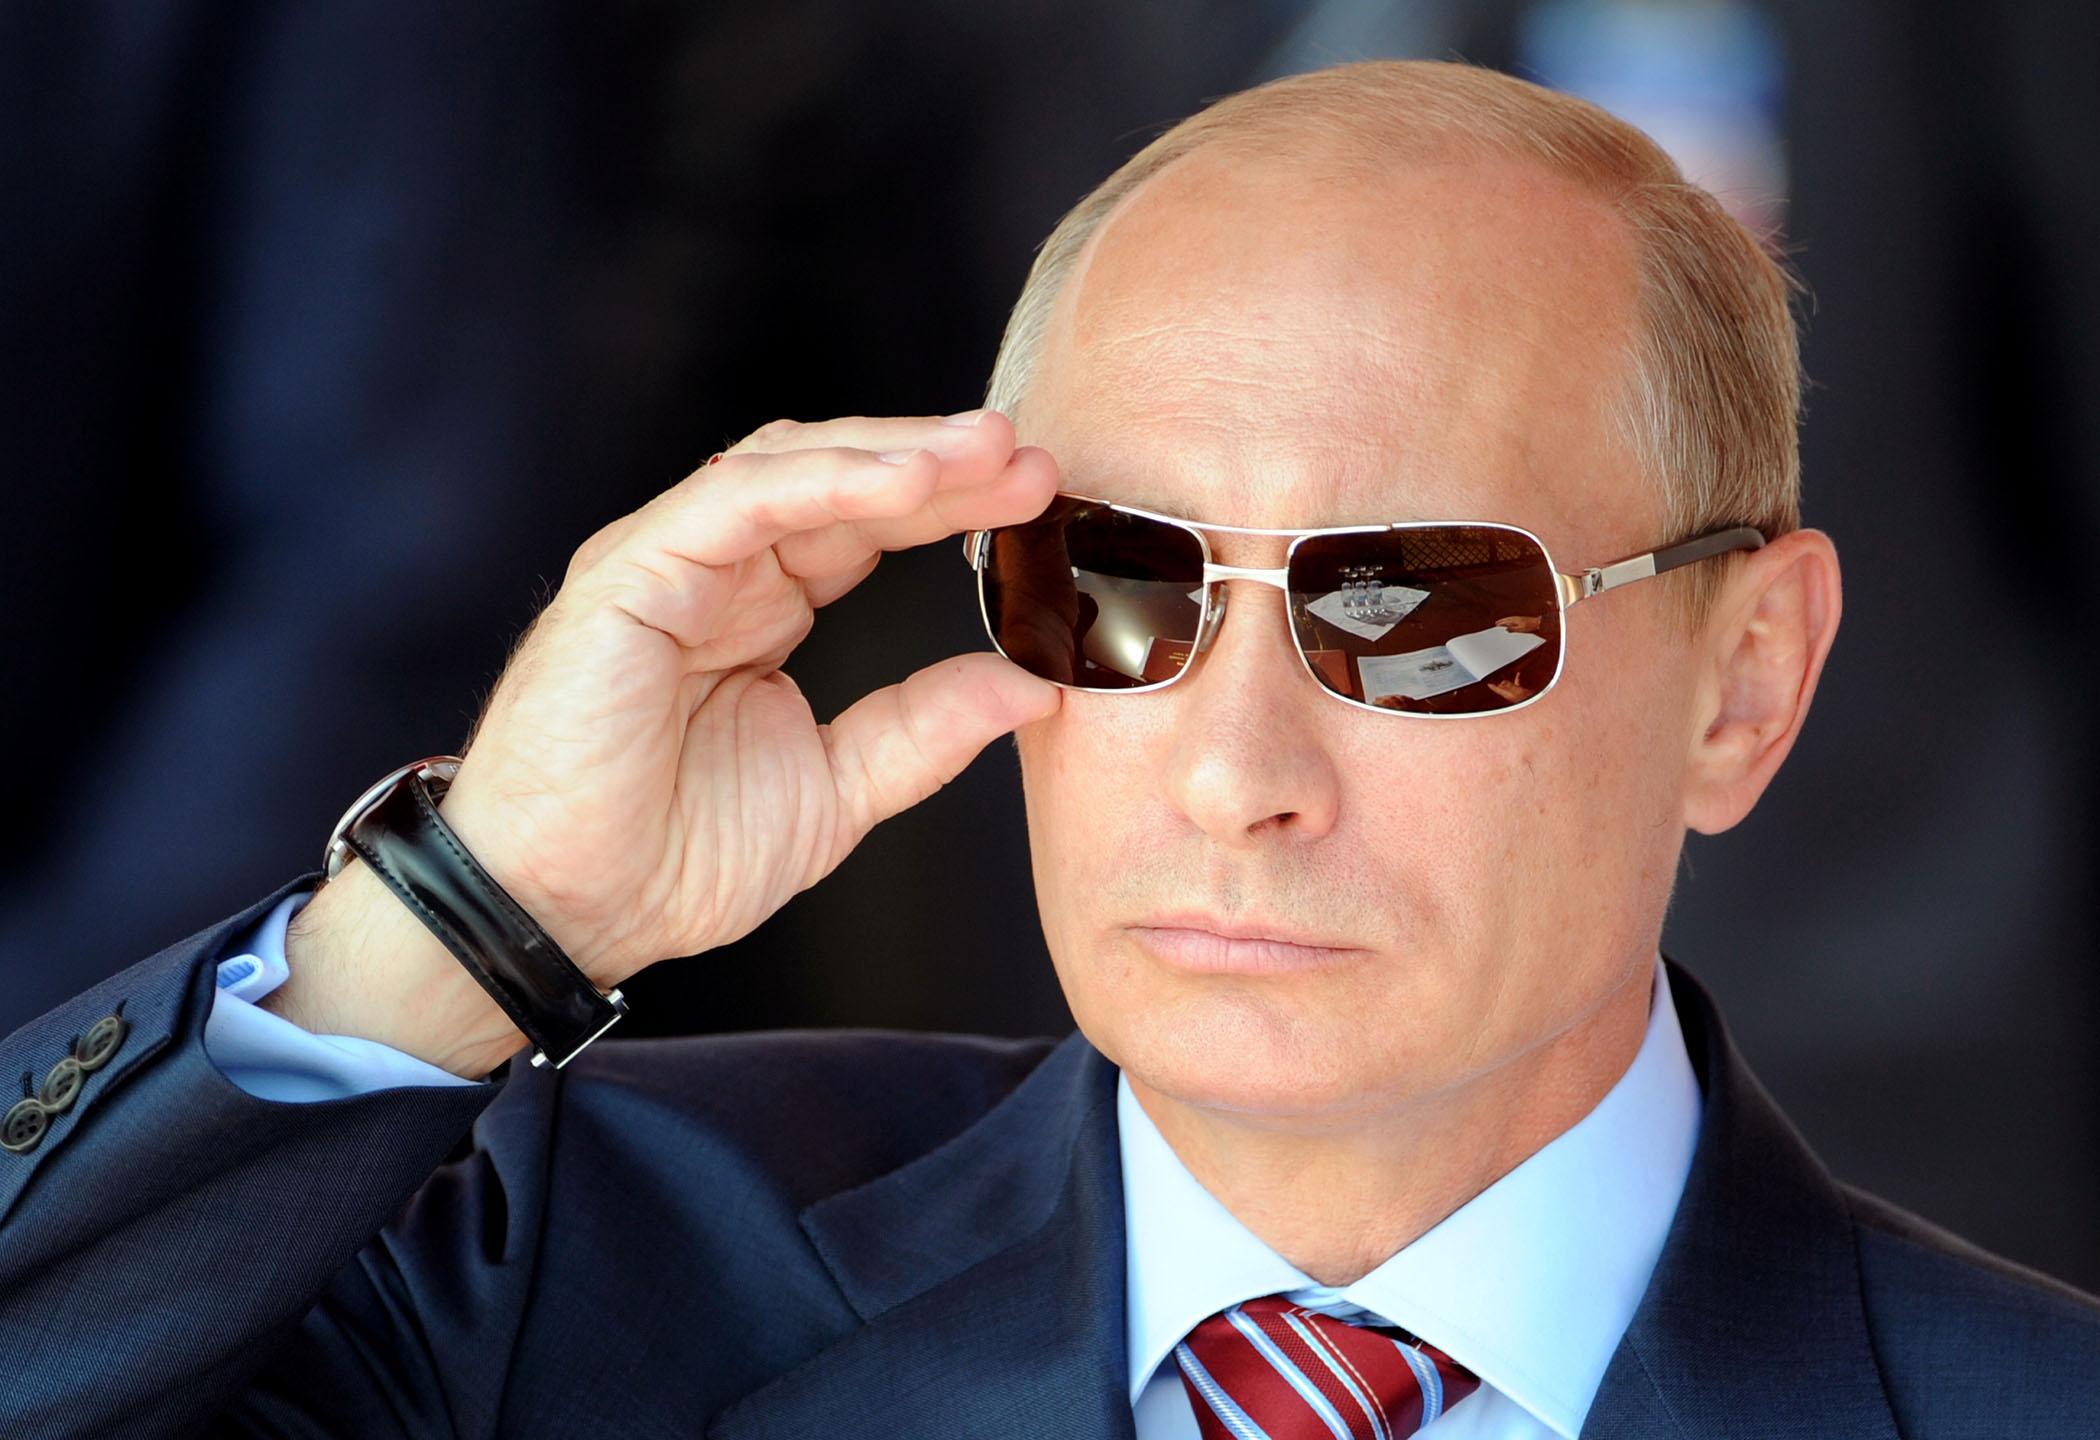 Putin in Sunglasses